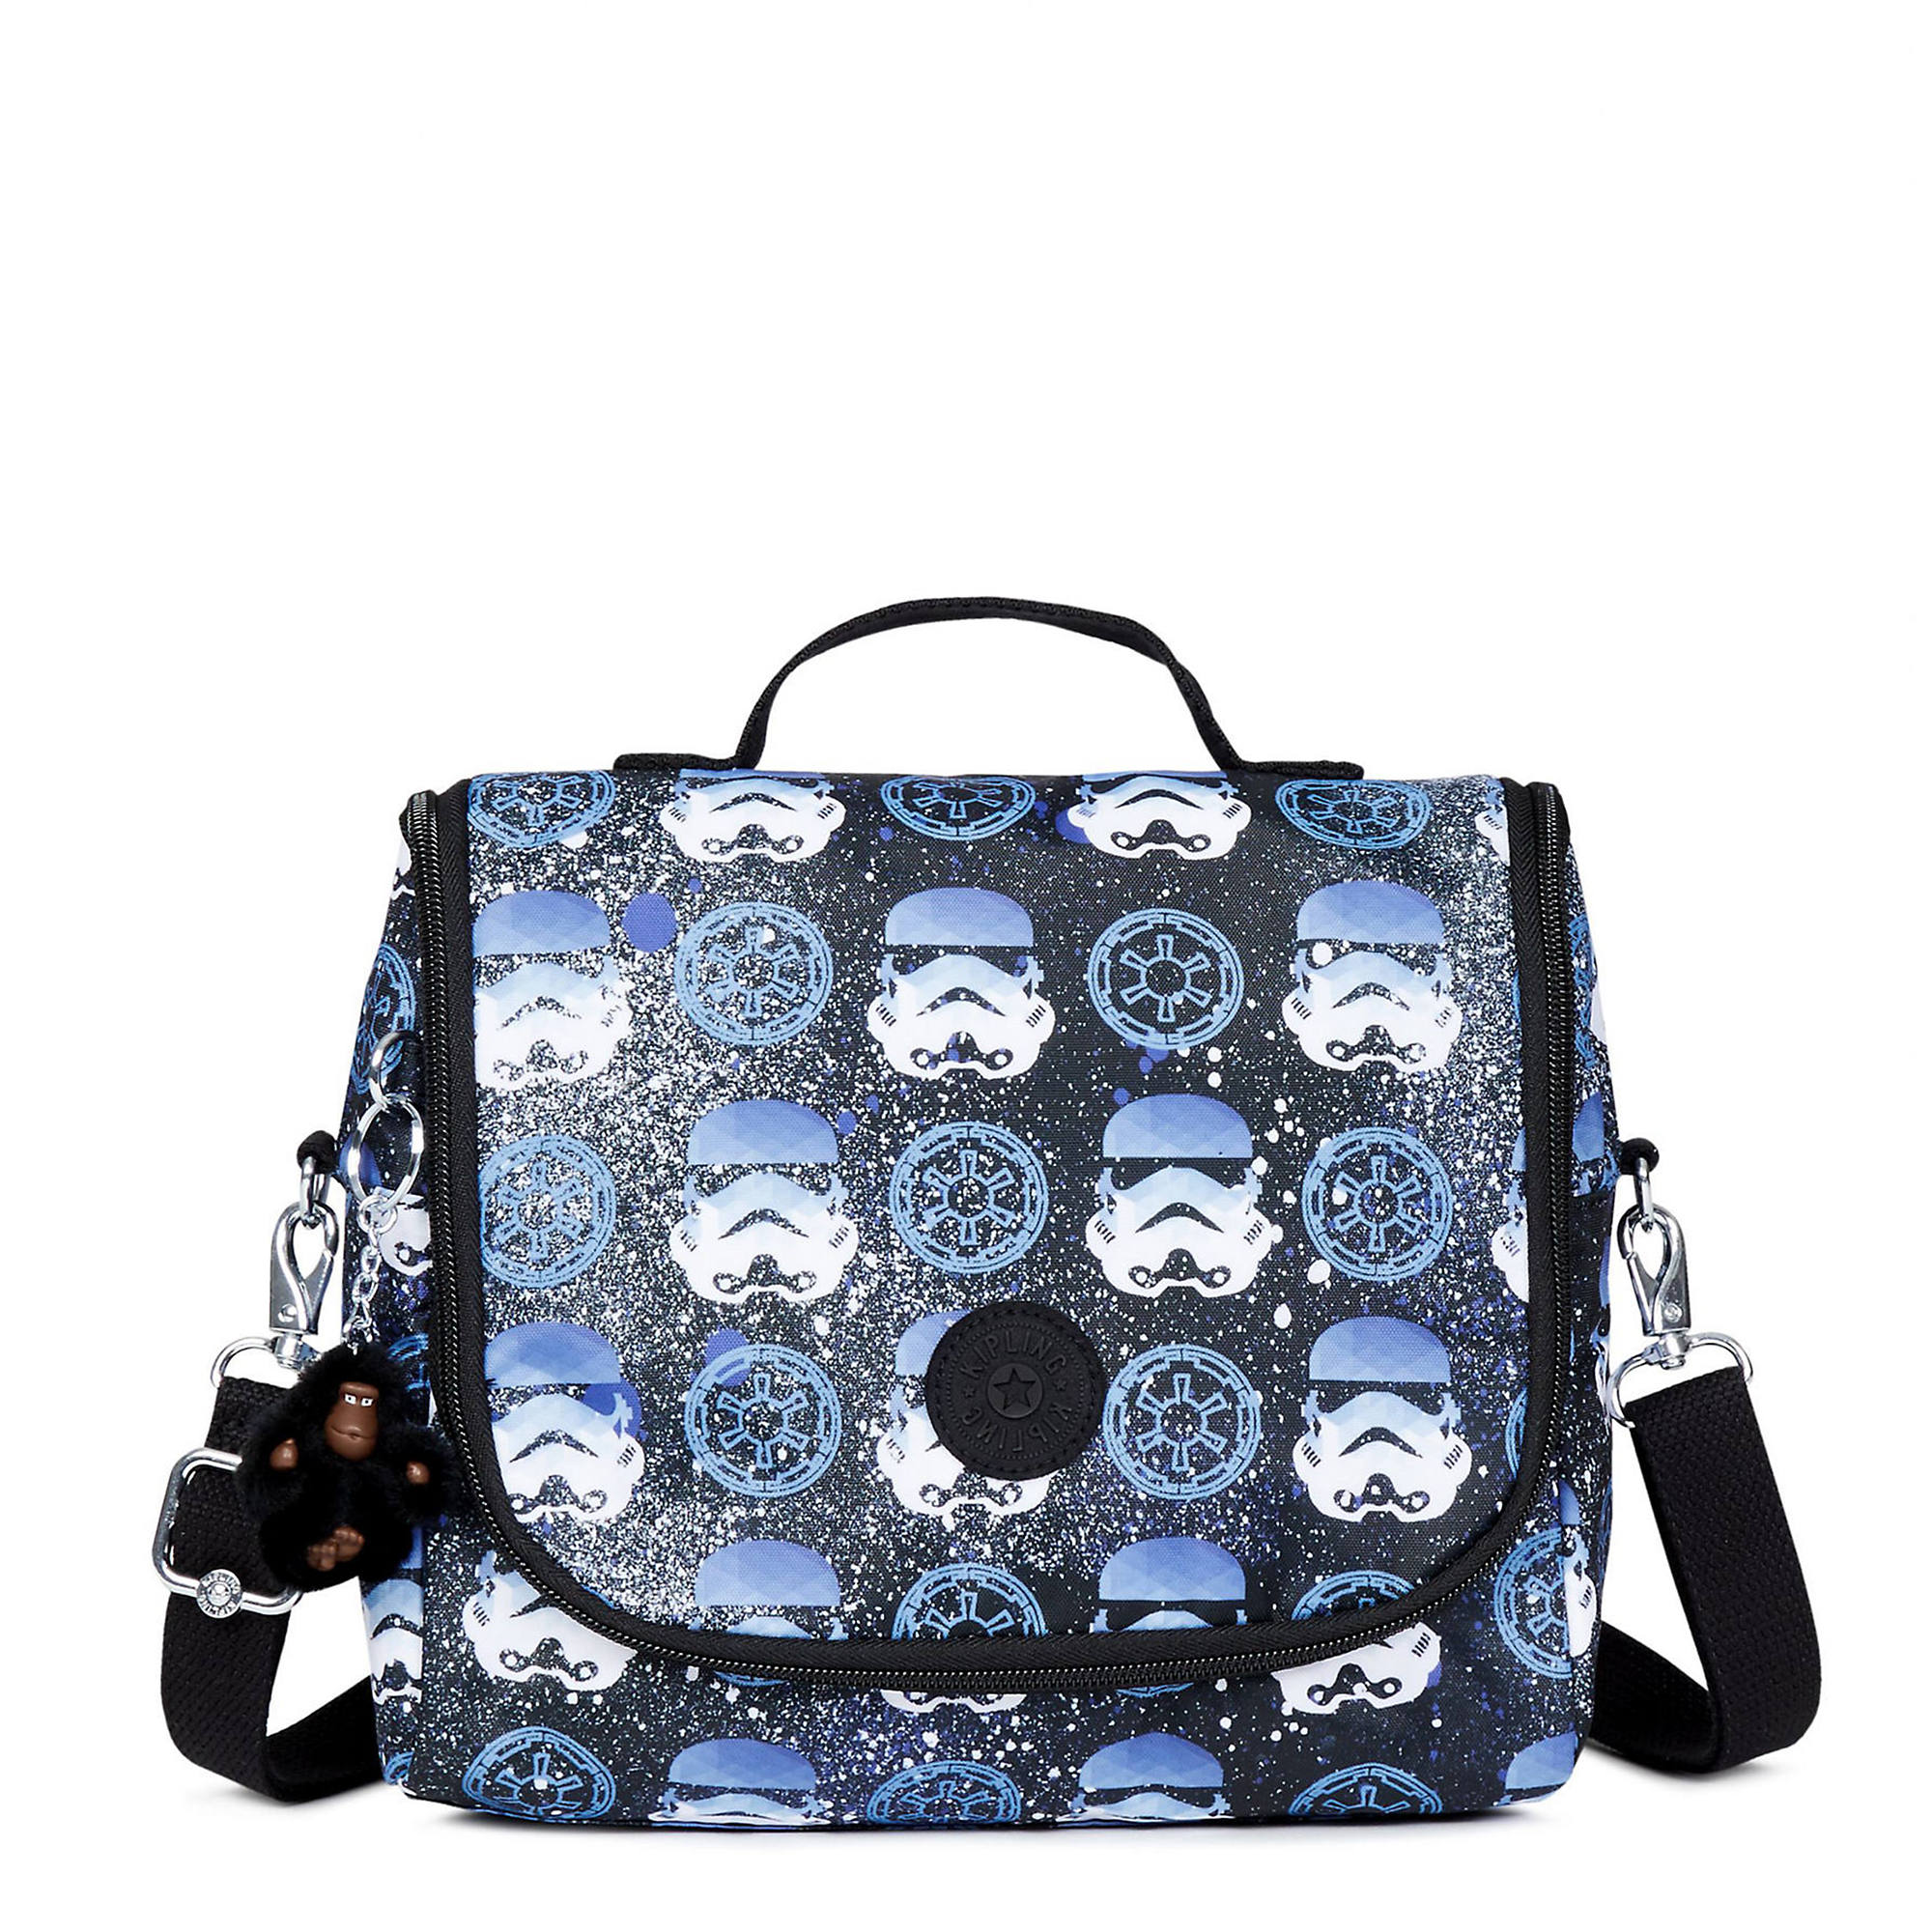 Star Wars Kichiriou Printed Lunch Bag Interstellar Storm Large